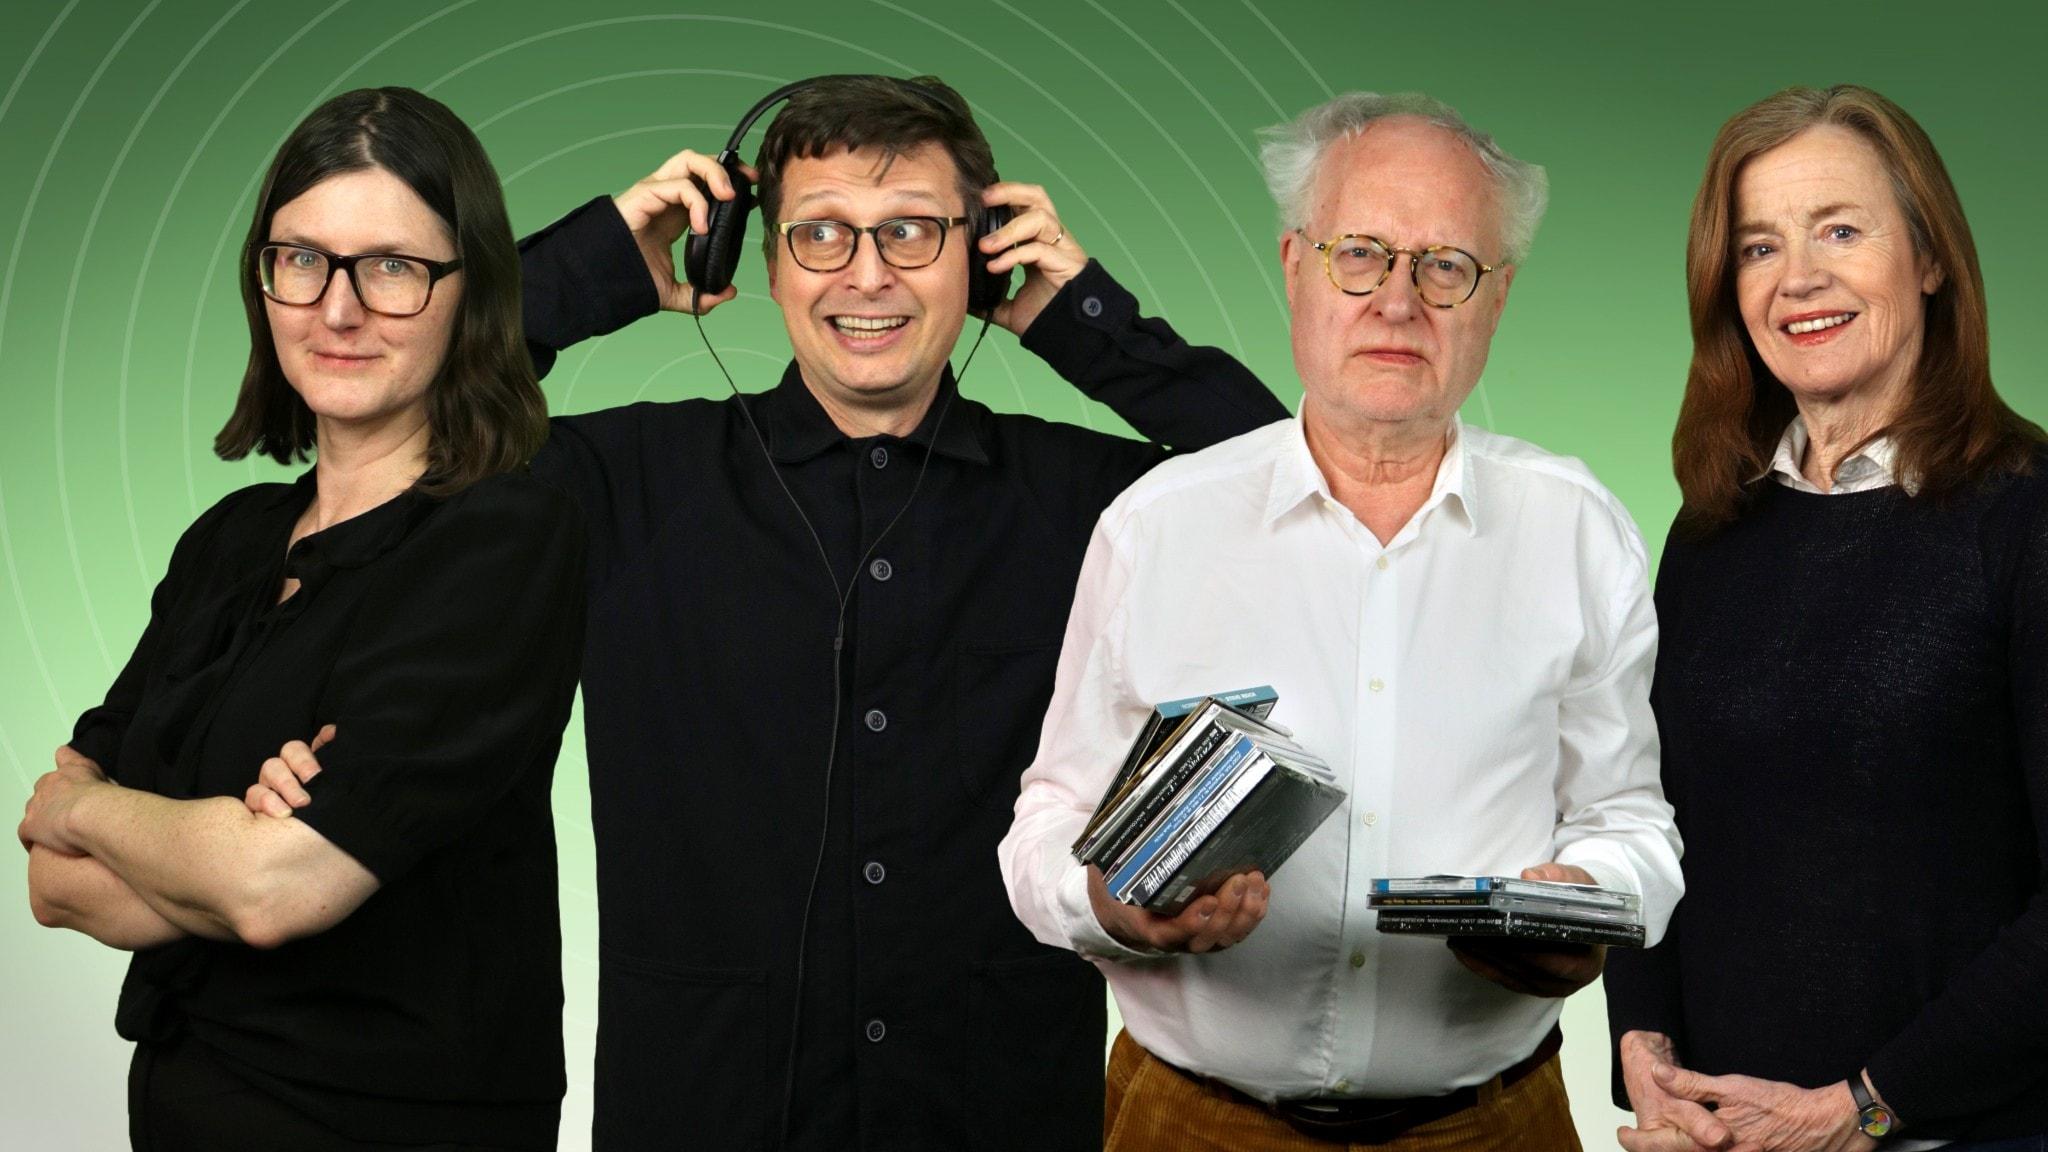 Sara Norling, Alexander Freudenthal, Bengt Forsberg och Camilla Lundberg.